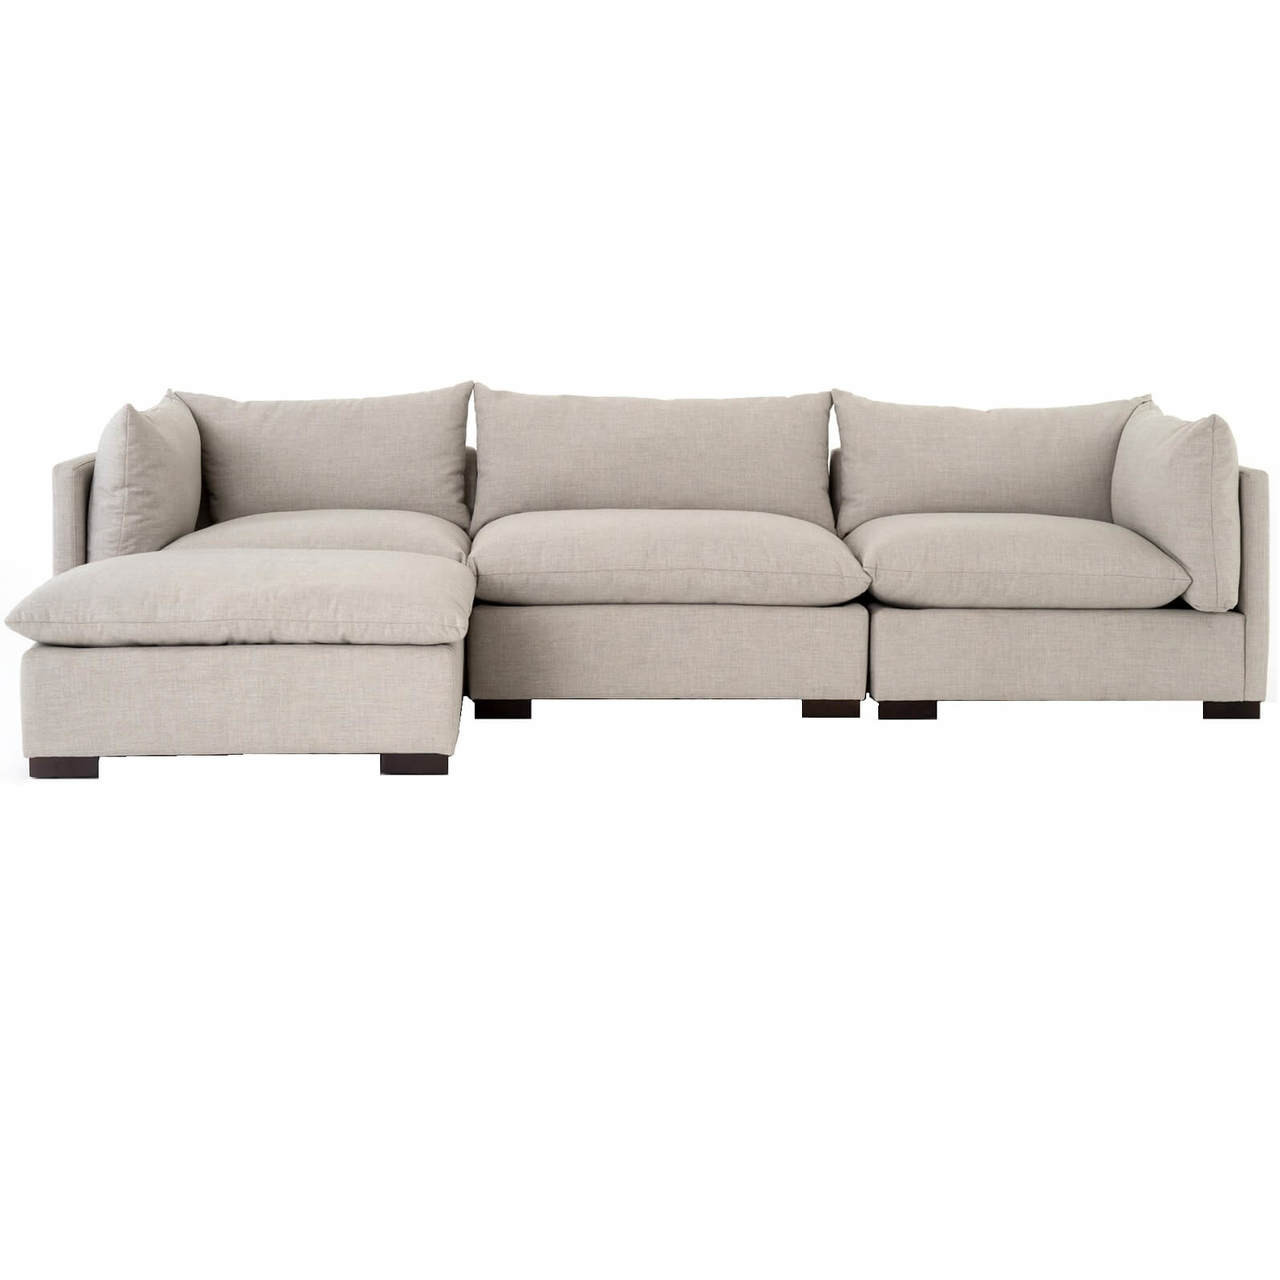 Sensational Westworld Modern Beige 4 Piece Modular Lounge Sectional Sofa Uwap Interior Chair Design Uwaporg